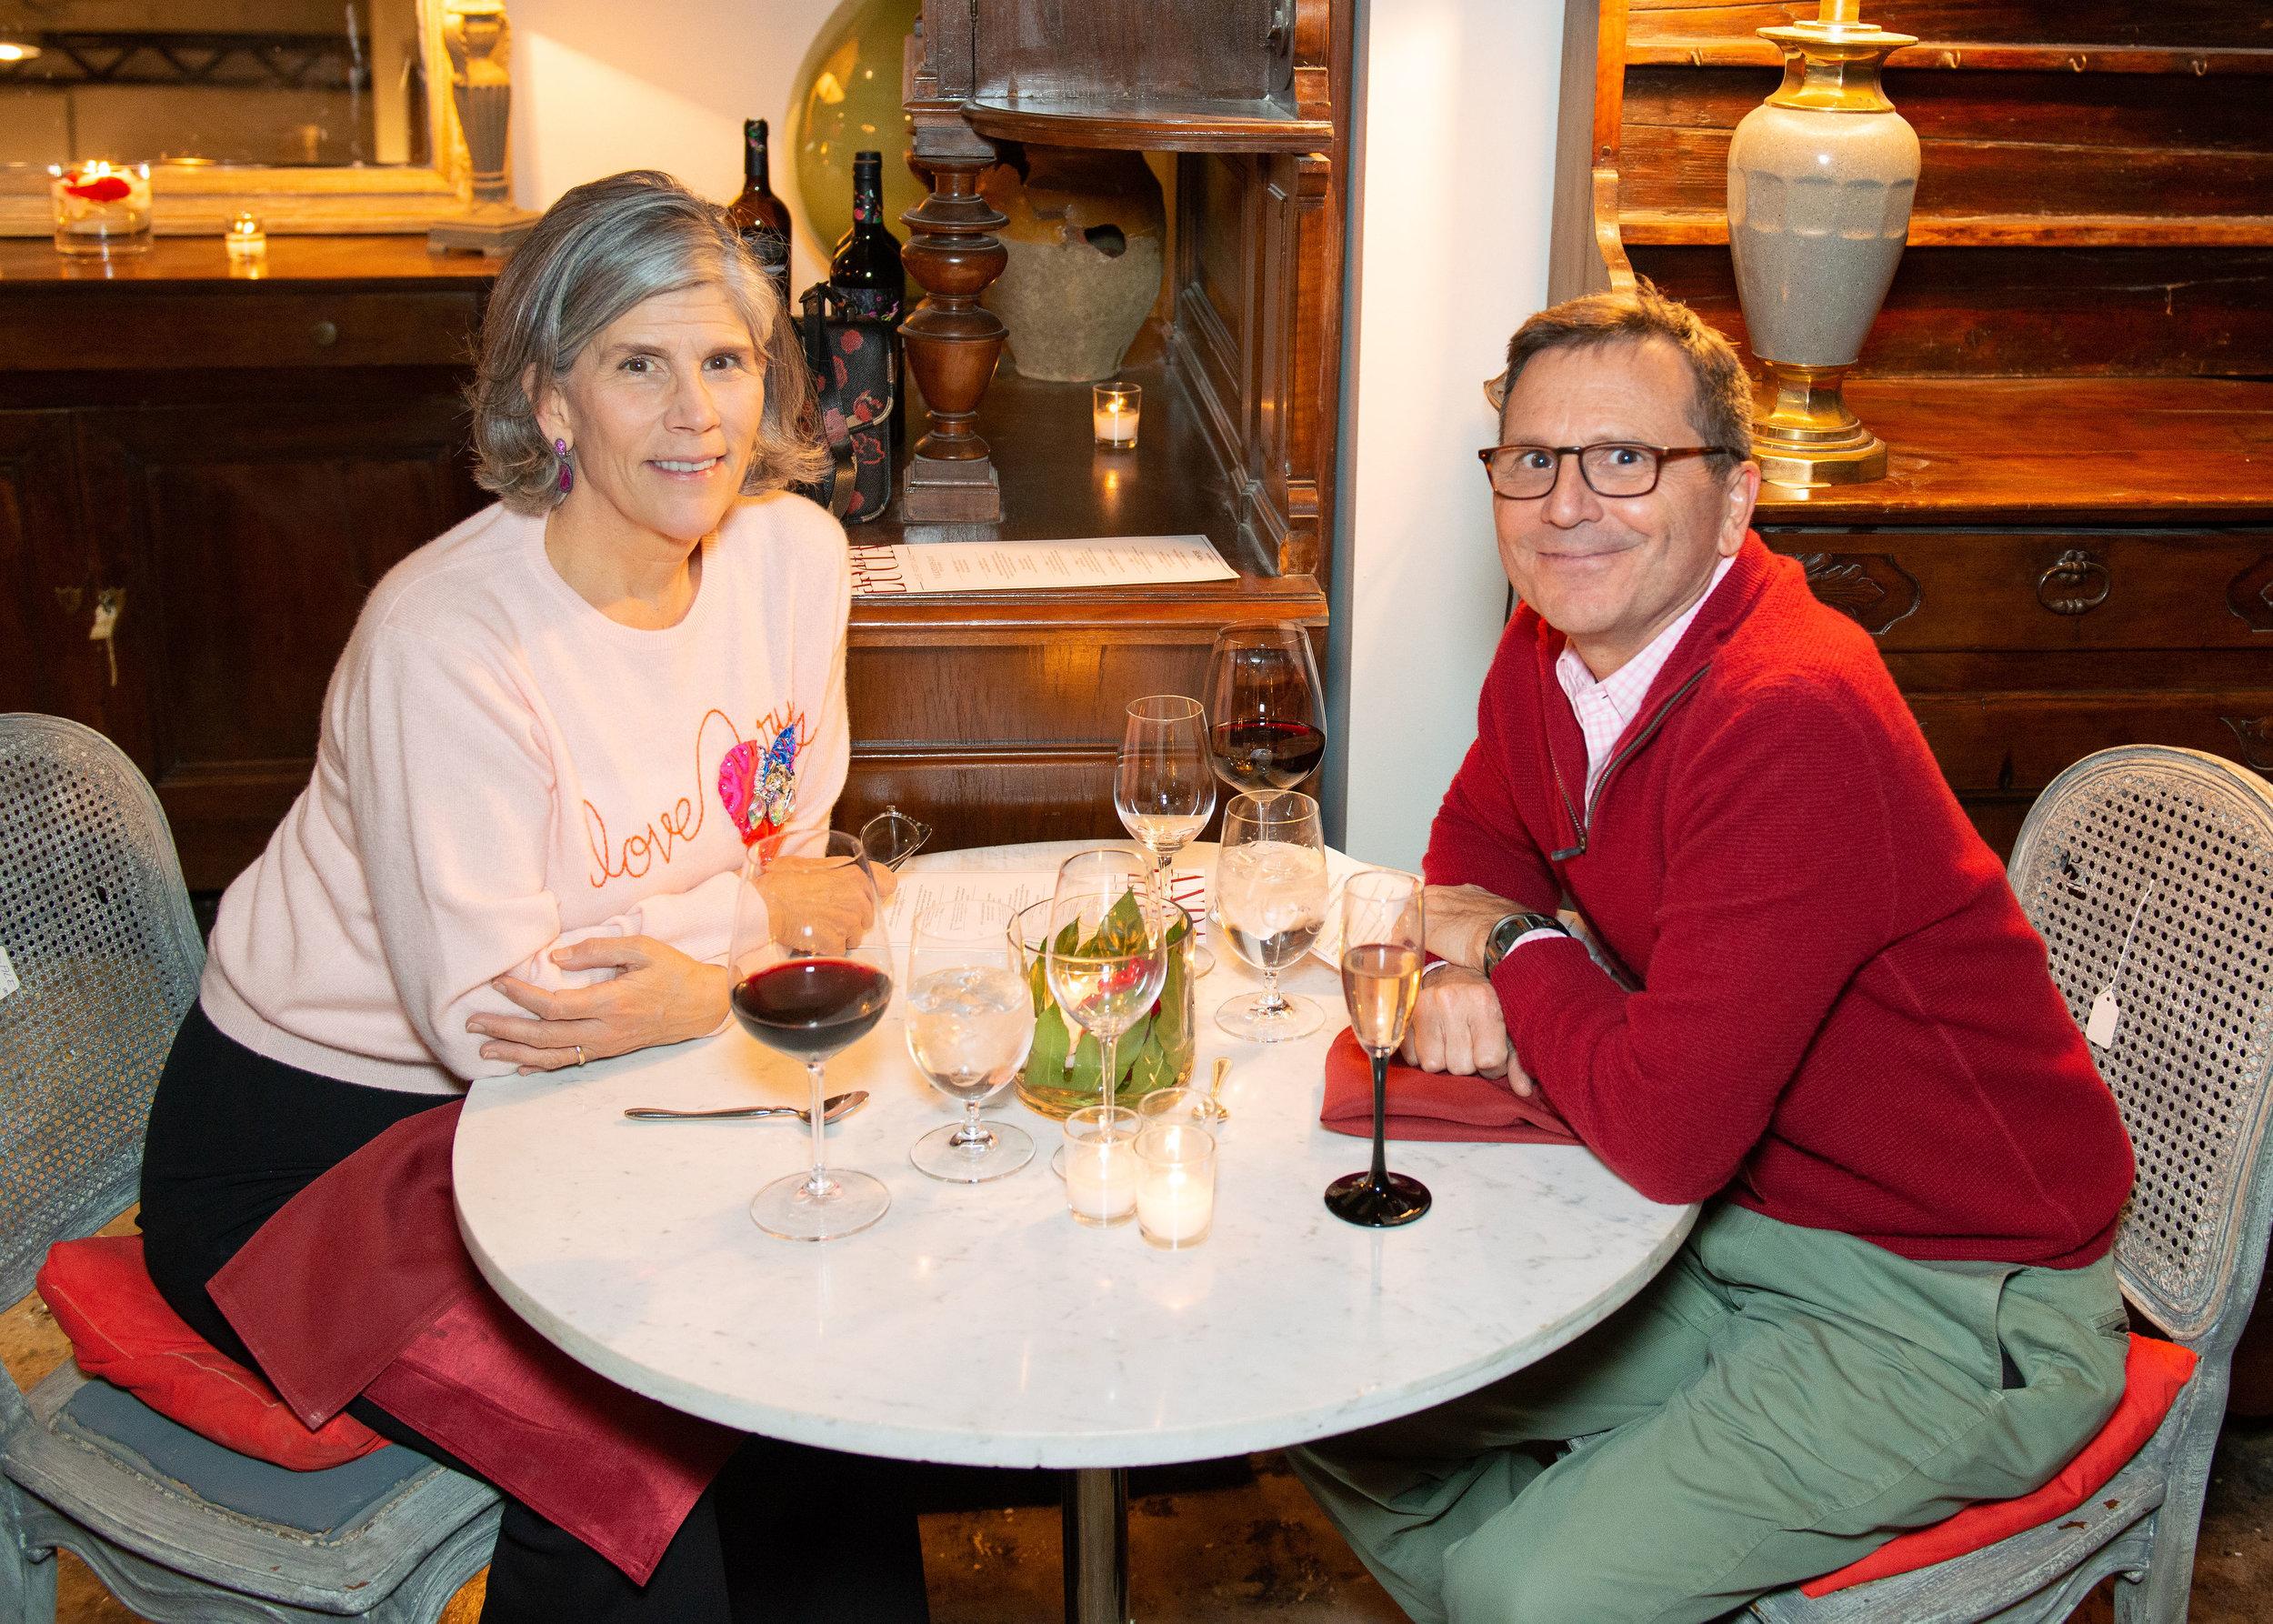 Lillian and Greg at Table copy.jpg